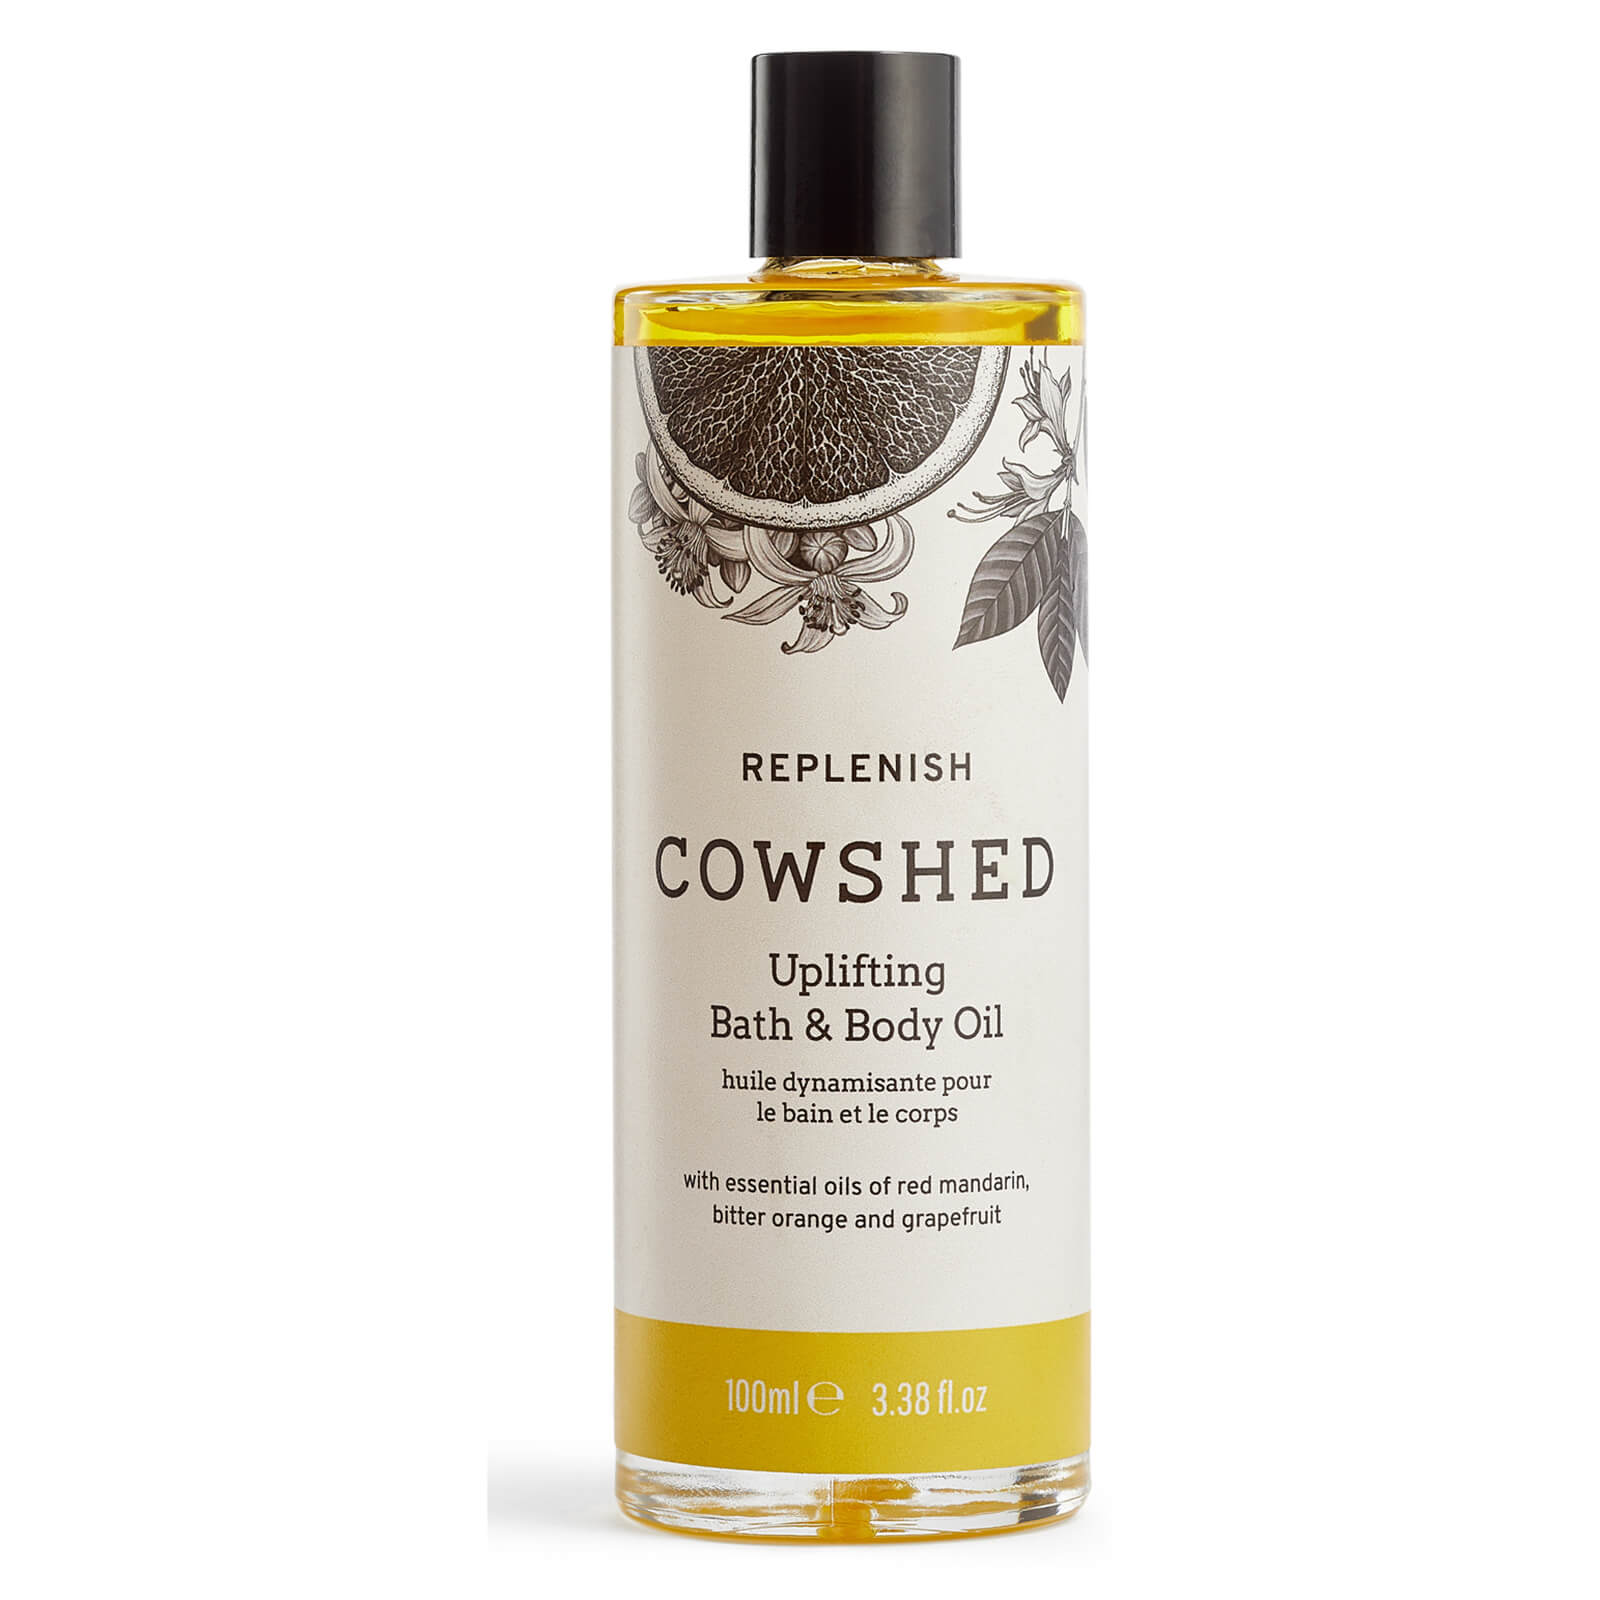 Купить Cowshed REPLENISH Uplifting Bath & Body Oil 100ml